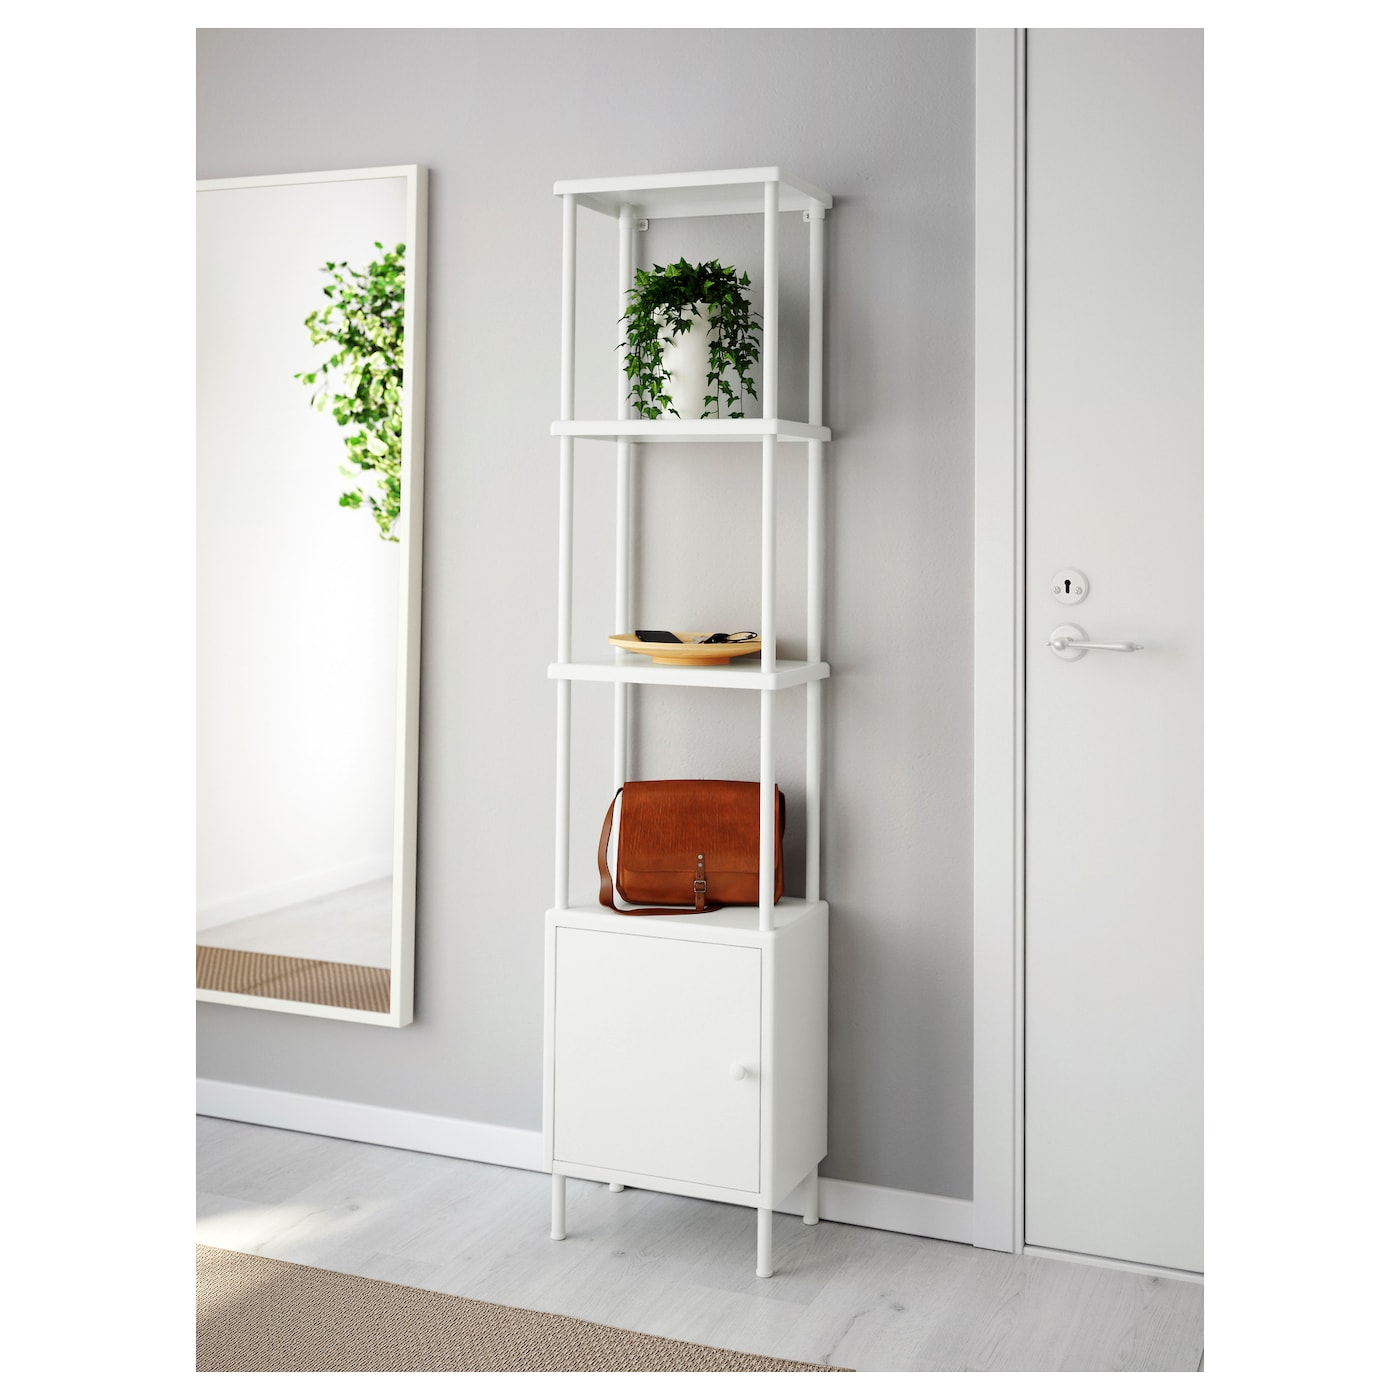 Dynan Estanteria Con Armario Blanco 40 X 27 X 174 Cm Ikea